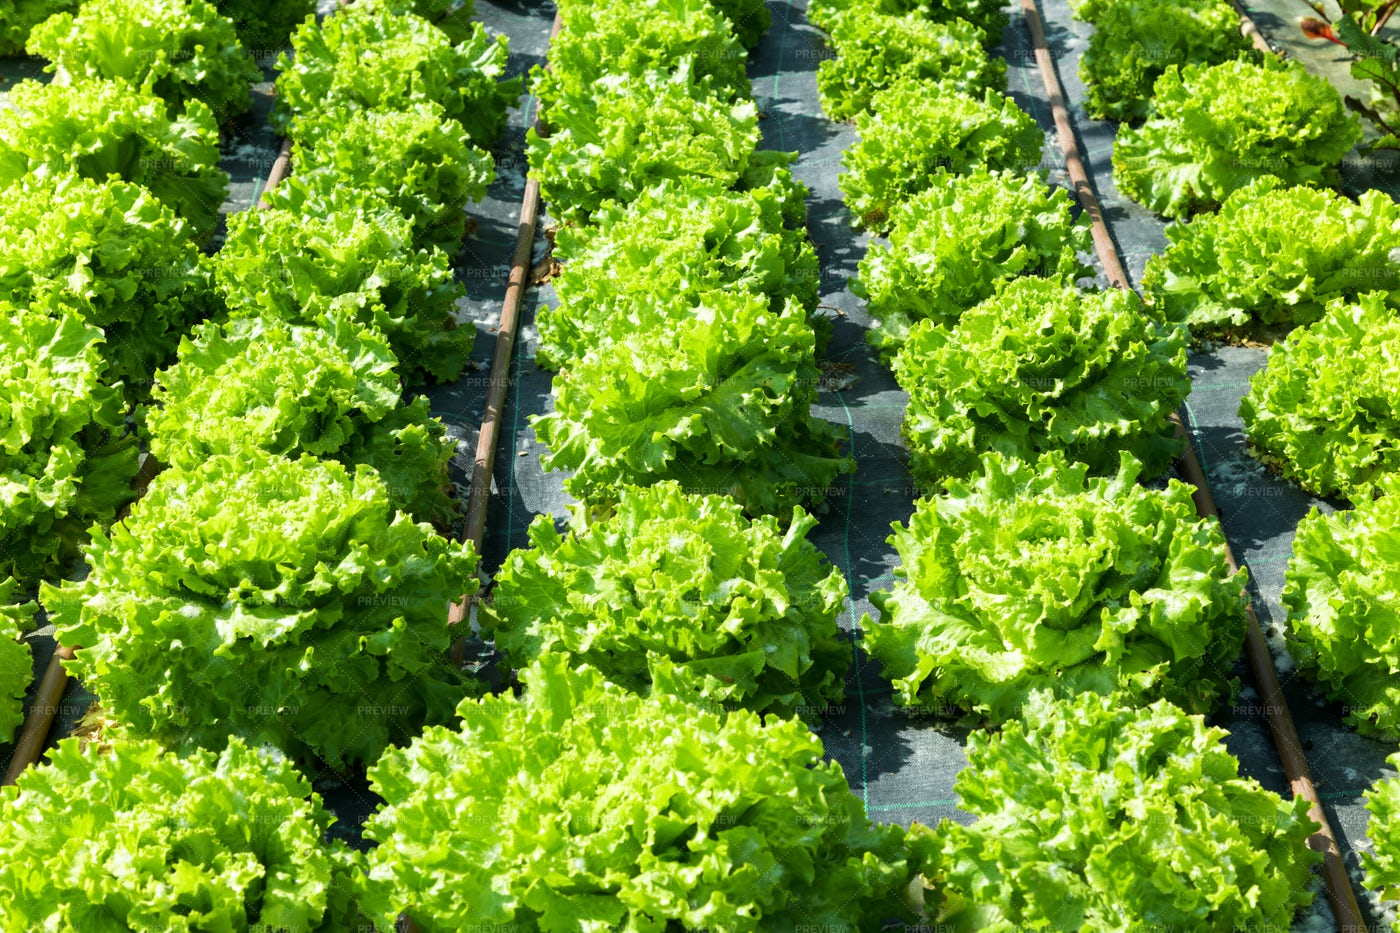 Rows Of Green Lettuce: Stock Photos